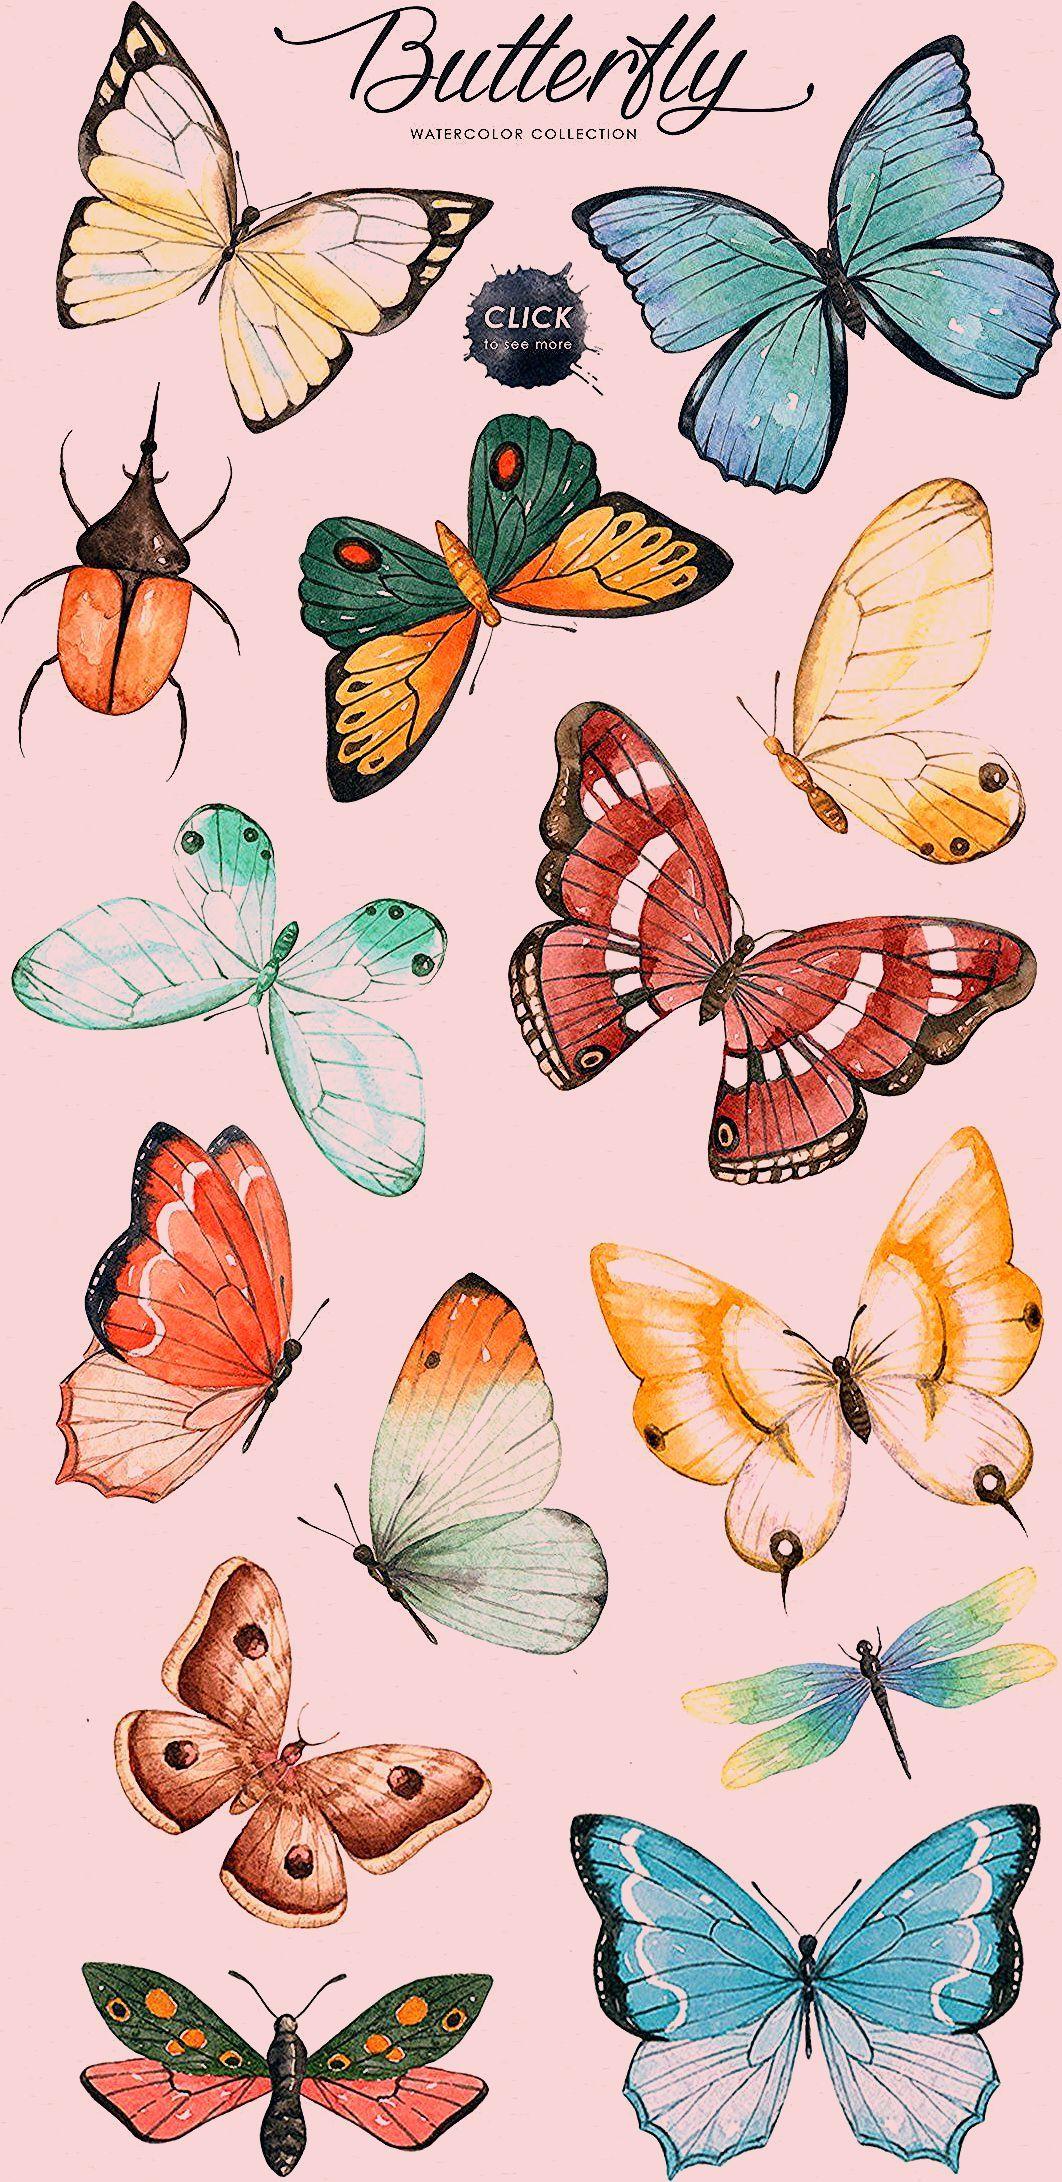 Druckvorlage Für Die Deko Schmetterlinge Butterfly Watercolor Anime Artwork Butterfly Drawing